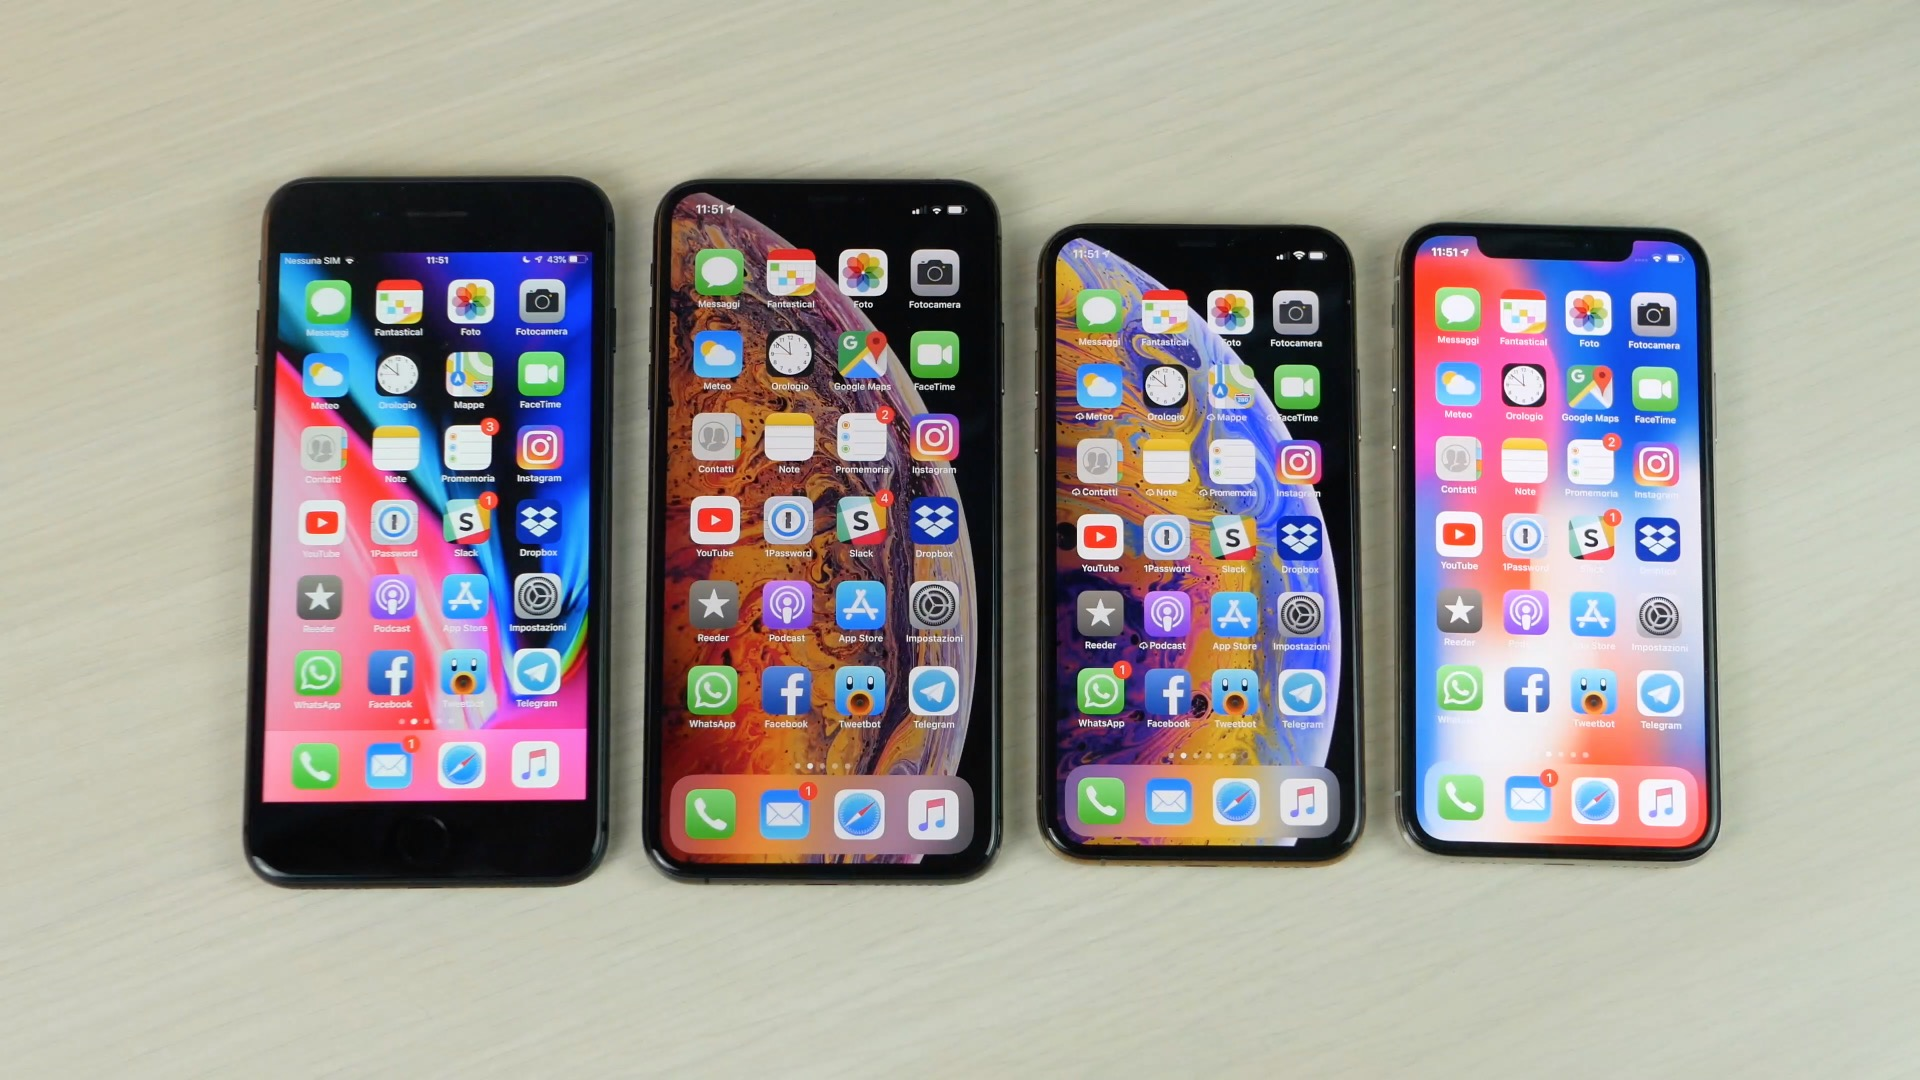 iPhone 8 Plus, iPhone Xs Max, iPhone Xs, iPhone X